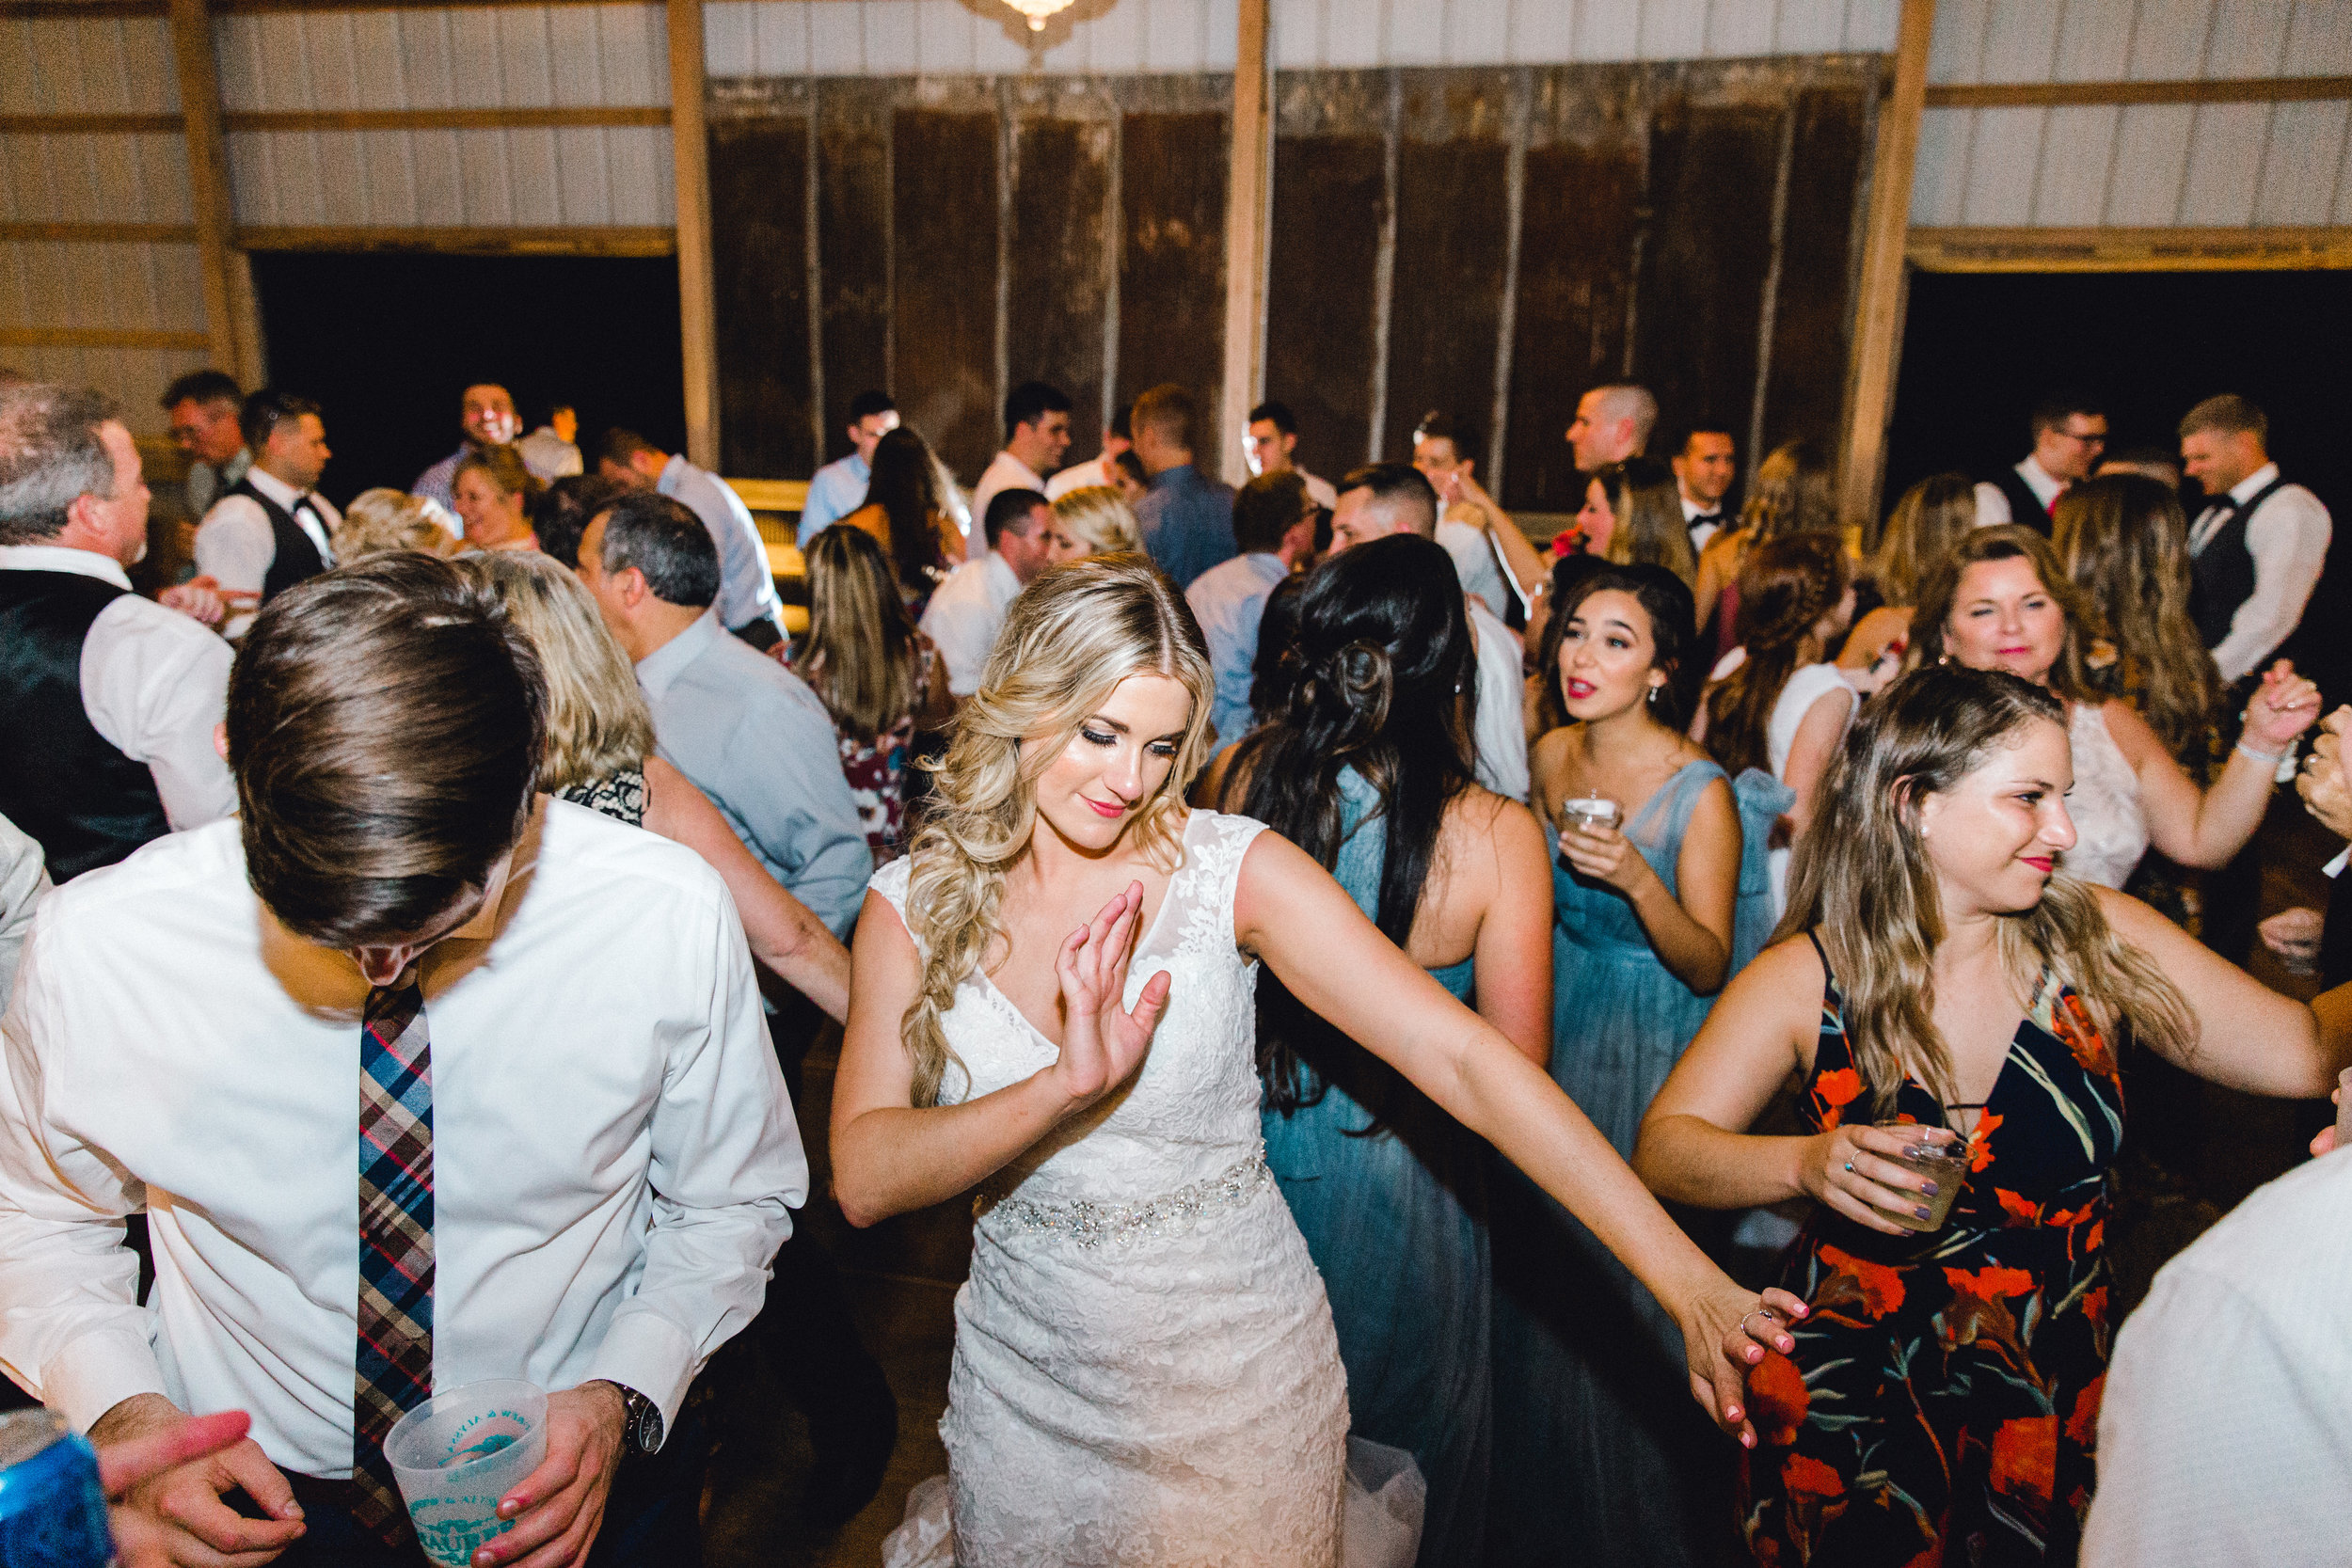 Paige-Mercer-Photography-Florida-Wedding-Photographer-Alyssa&Drew-96.jpg